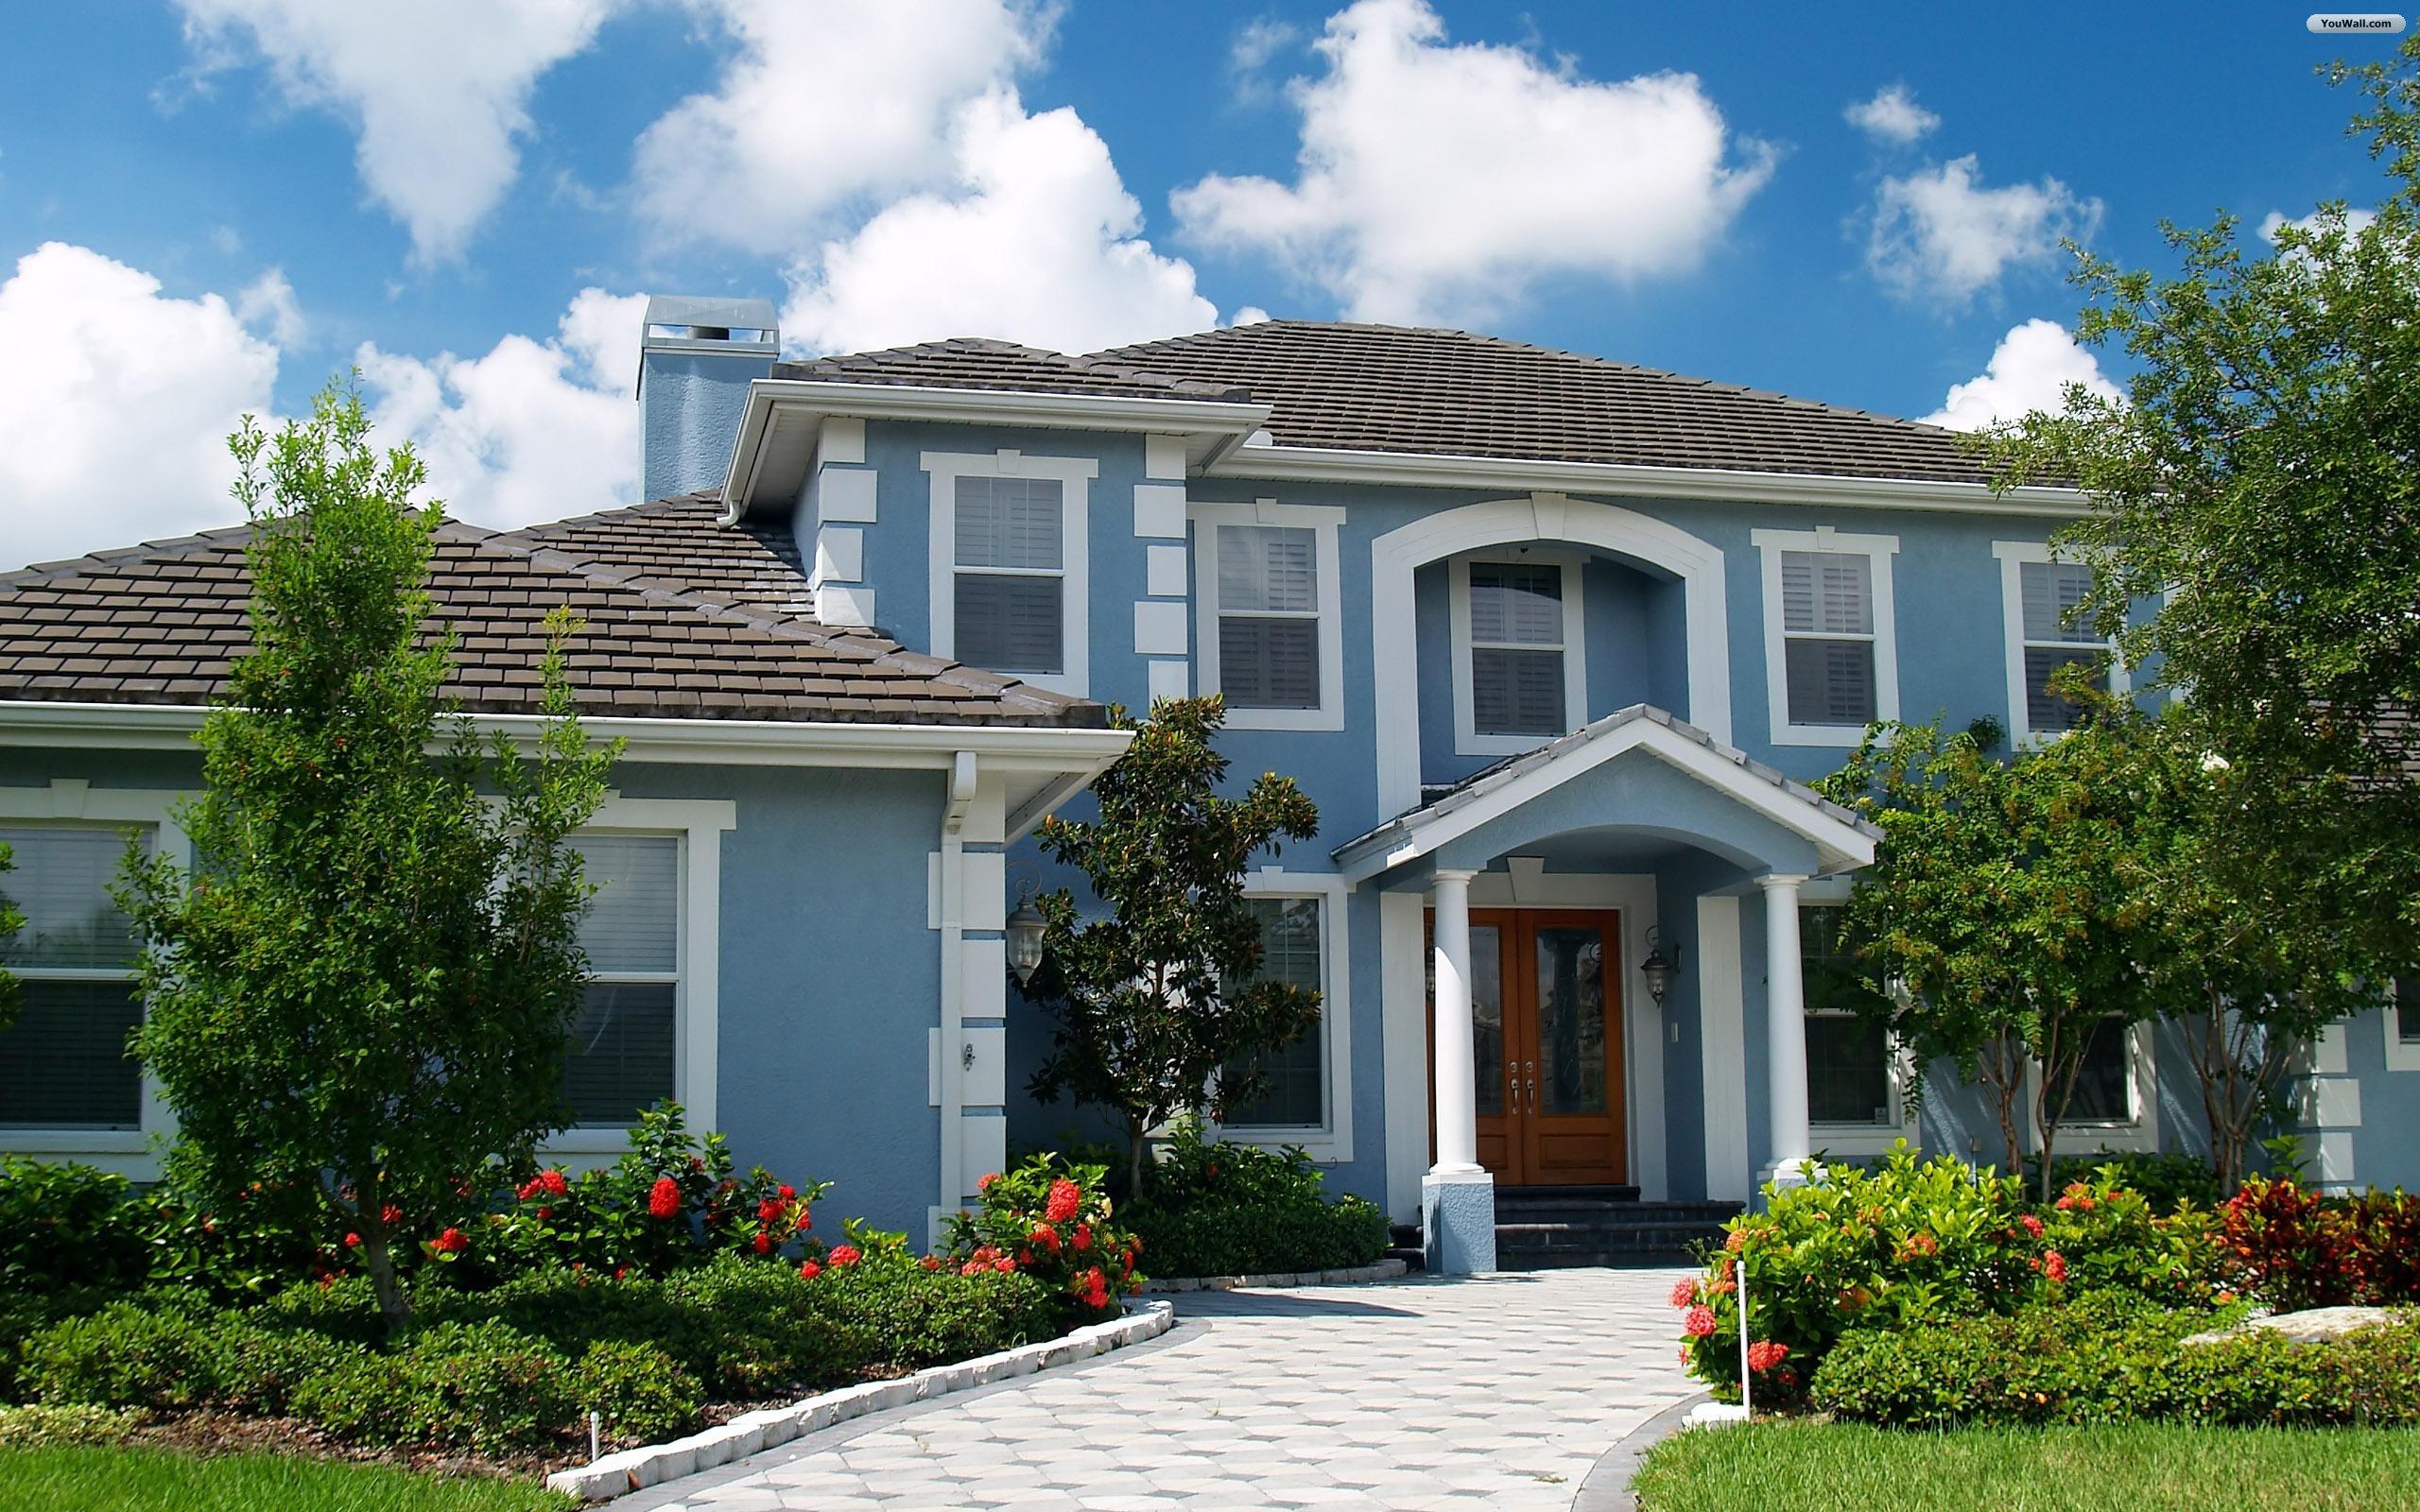 House Wallpaper   wallpaperwallpapersfree wallpaperphotodesktop 2560x1600